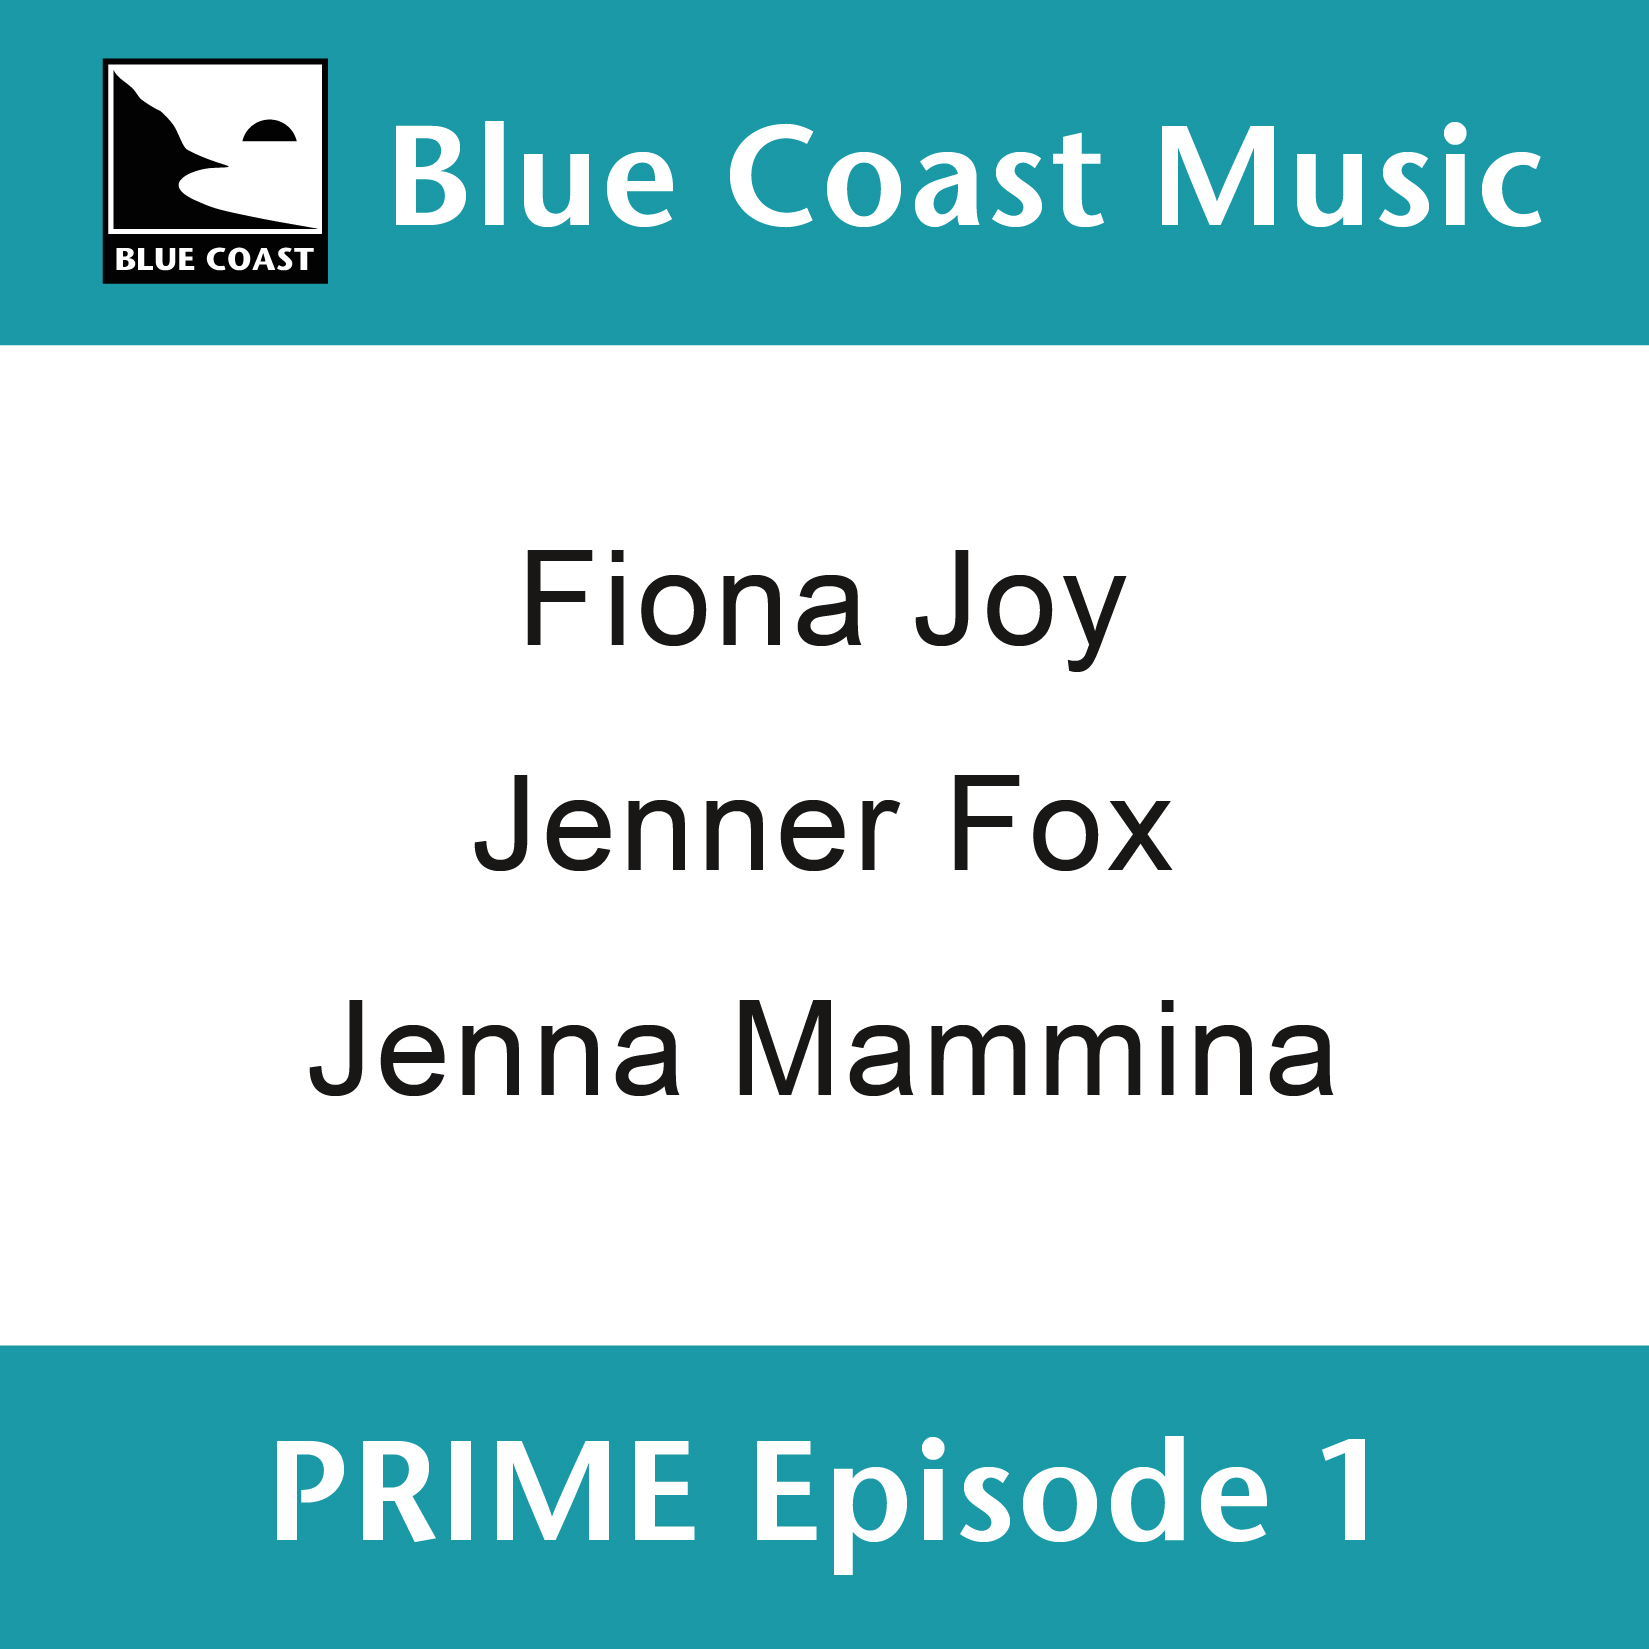 PRIME Episode 1 - Cover Image